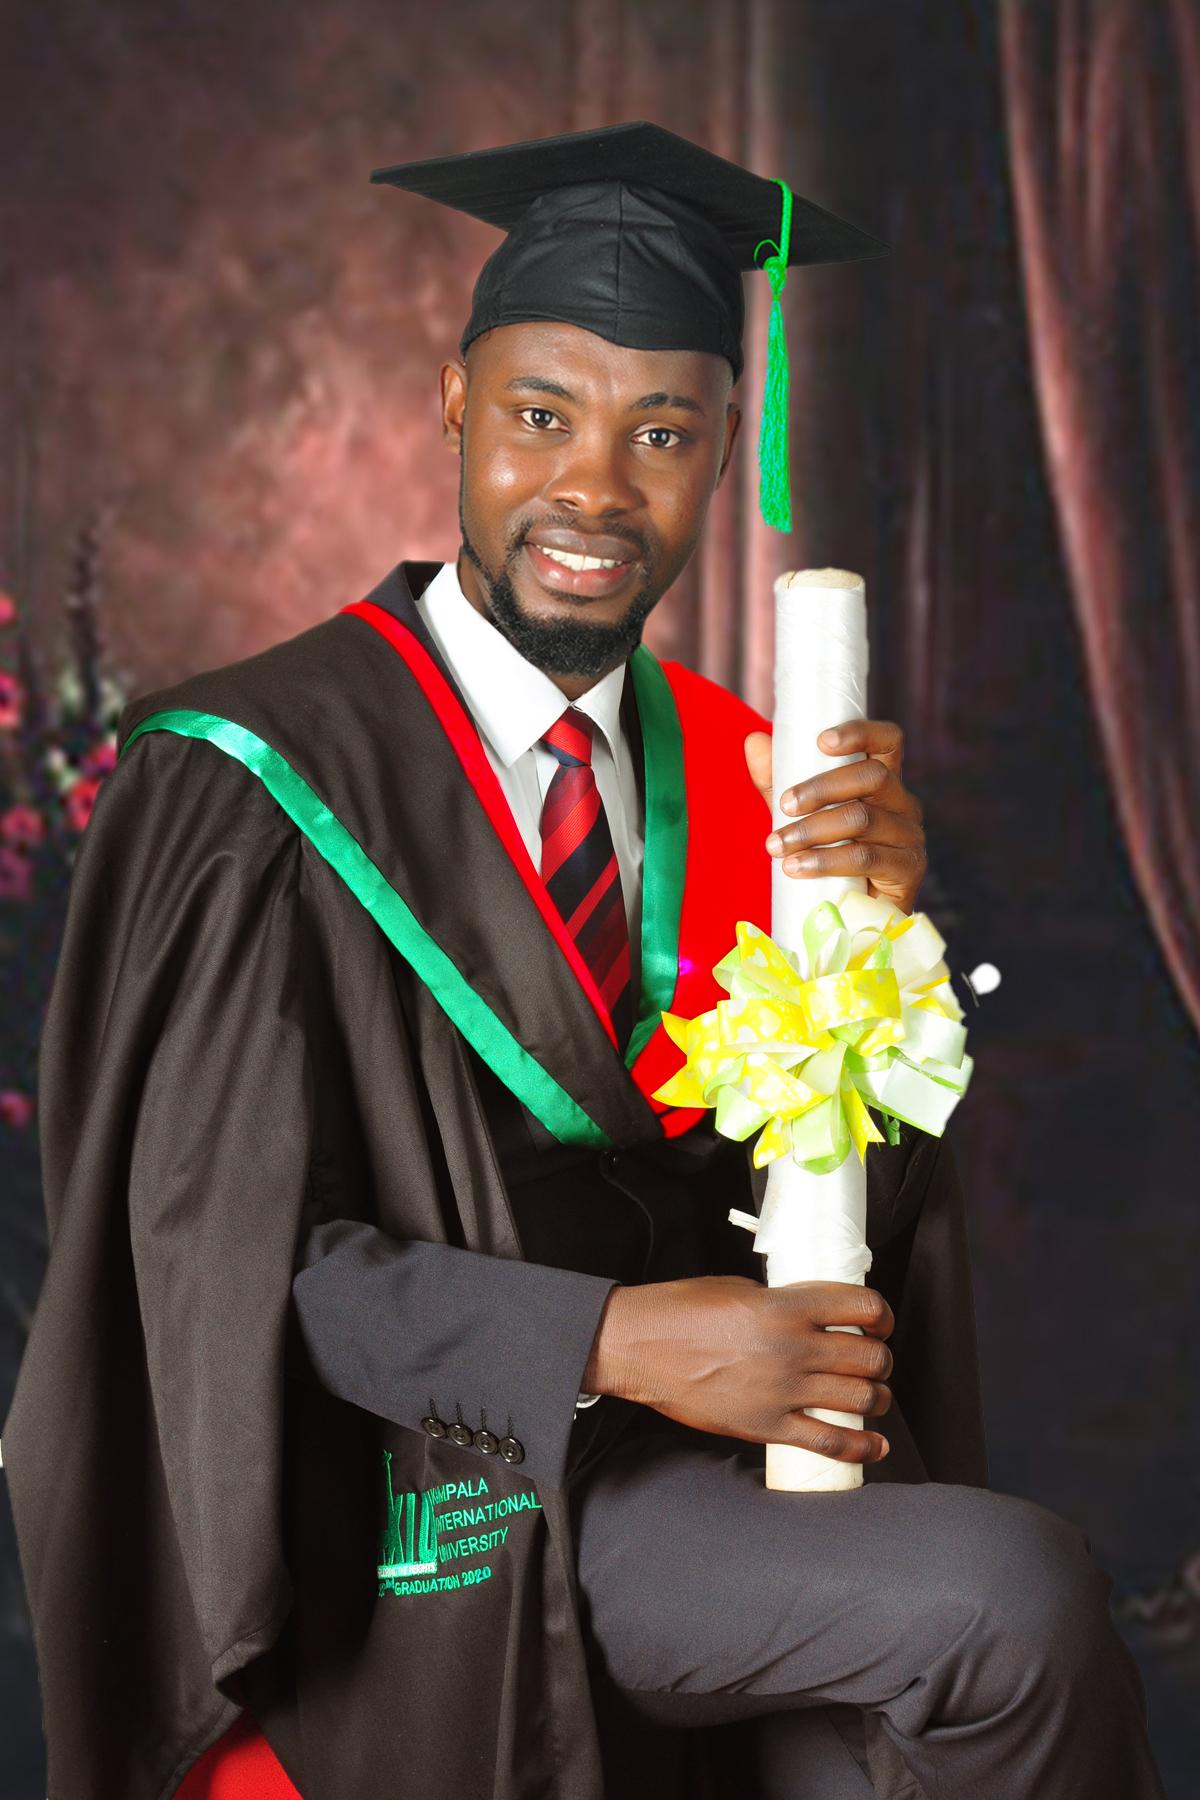 Athanasios graduation